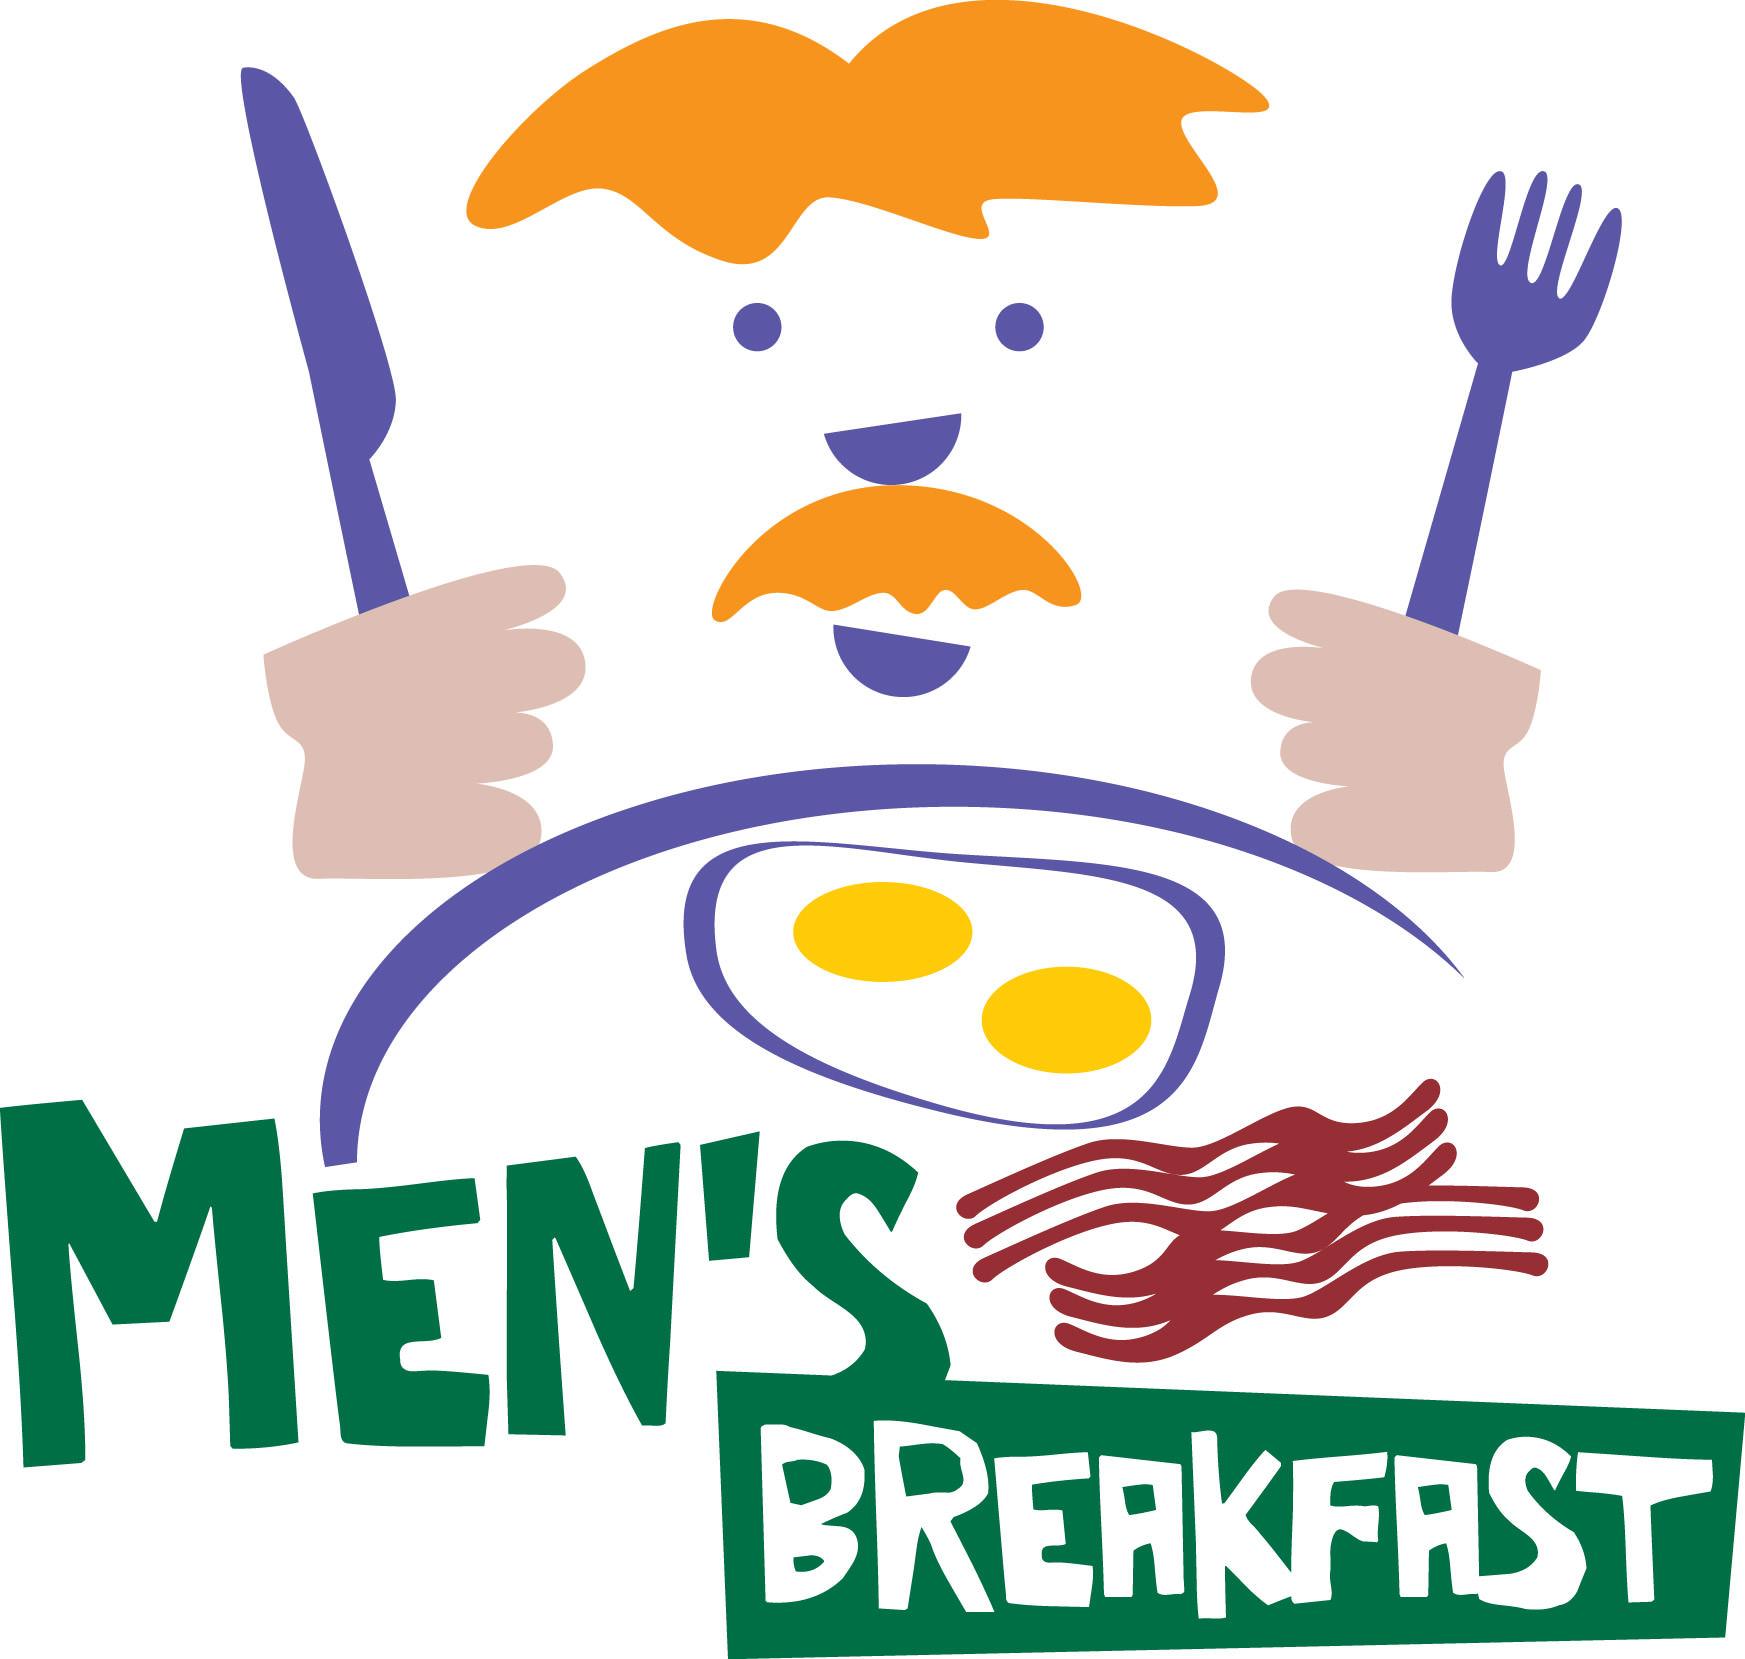 Free Men's Breakfast Cliparts, Download Free Clip Art, Free Clip Art.